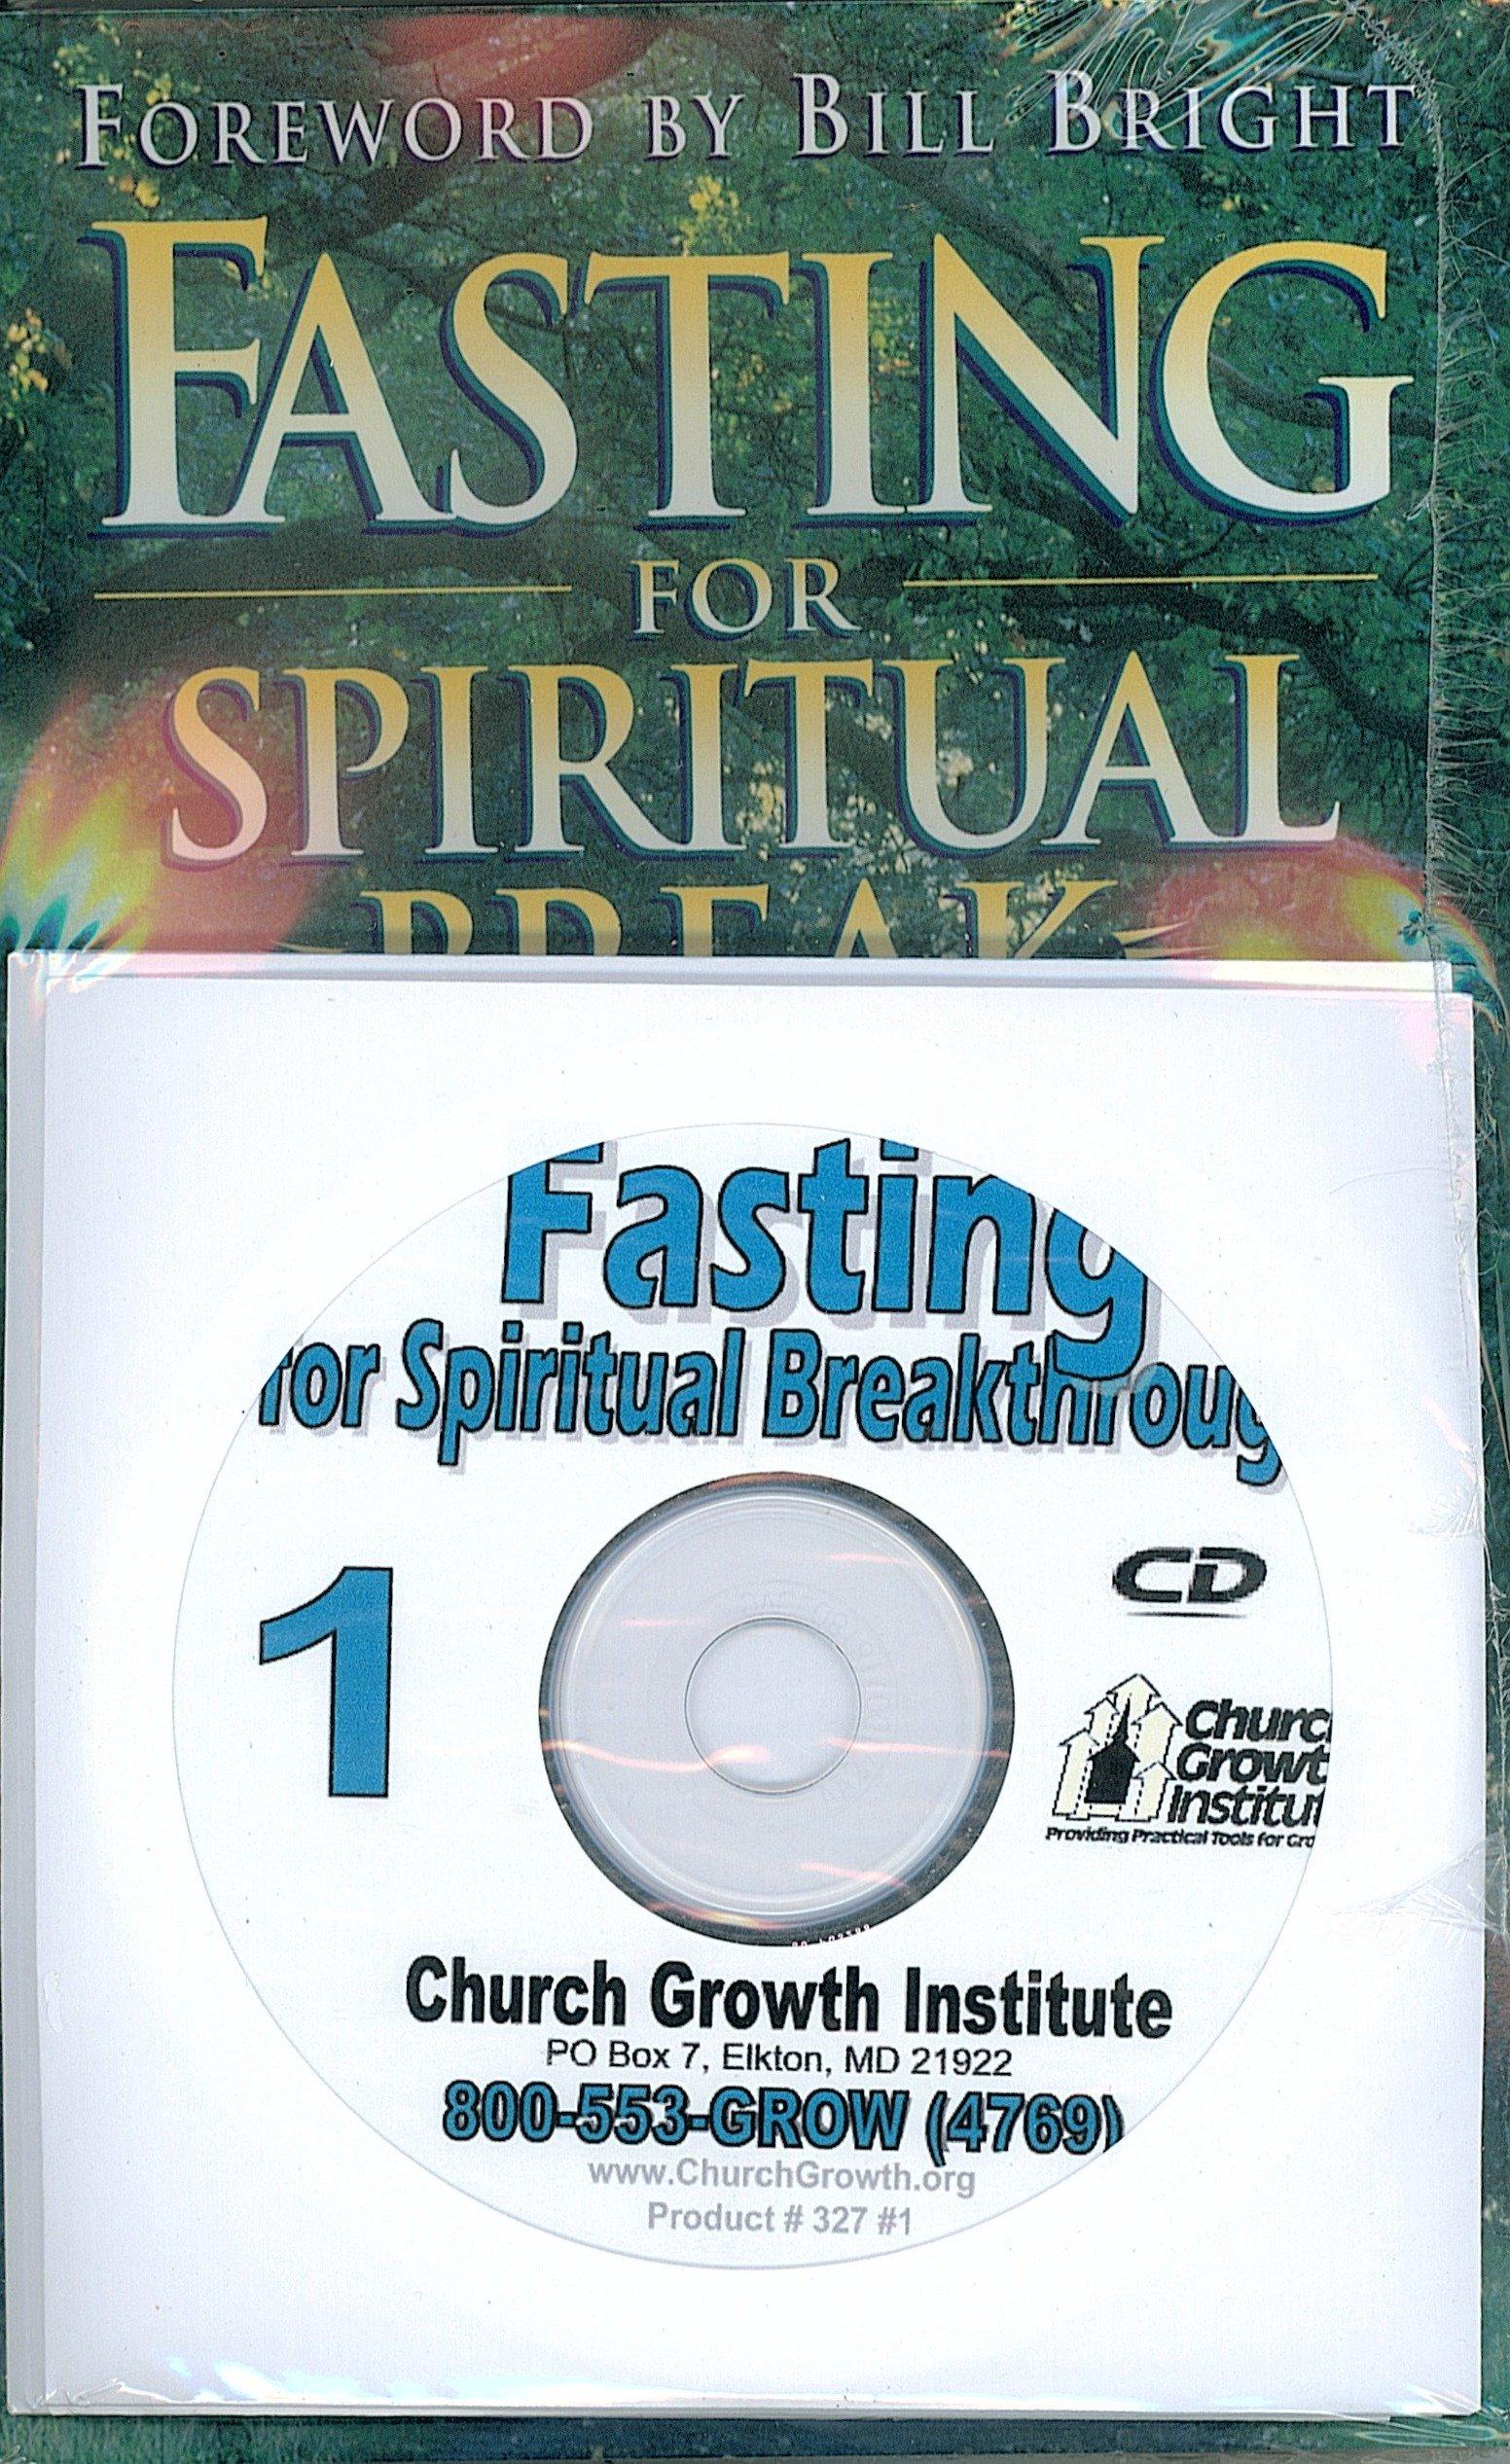 Fasting For Spiritual Breakthrough & Audio Seminars on CDs